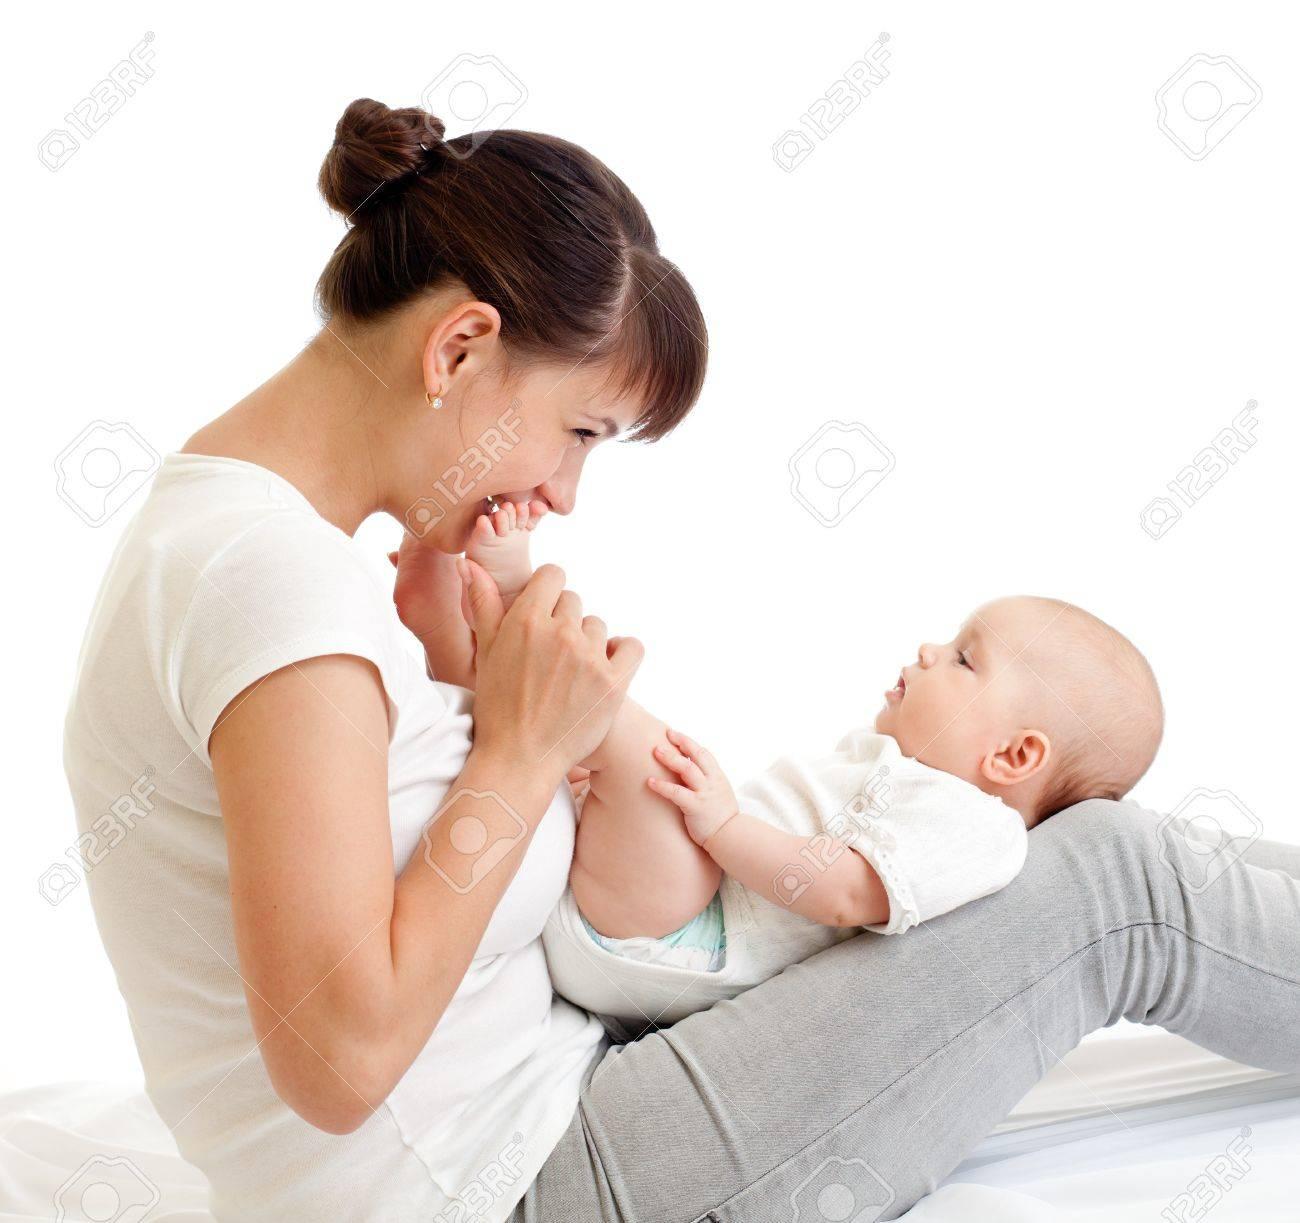 joyful mother kissing her baby infant Stock Photo - 13944553